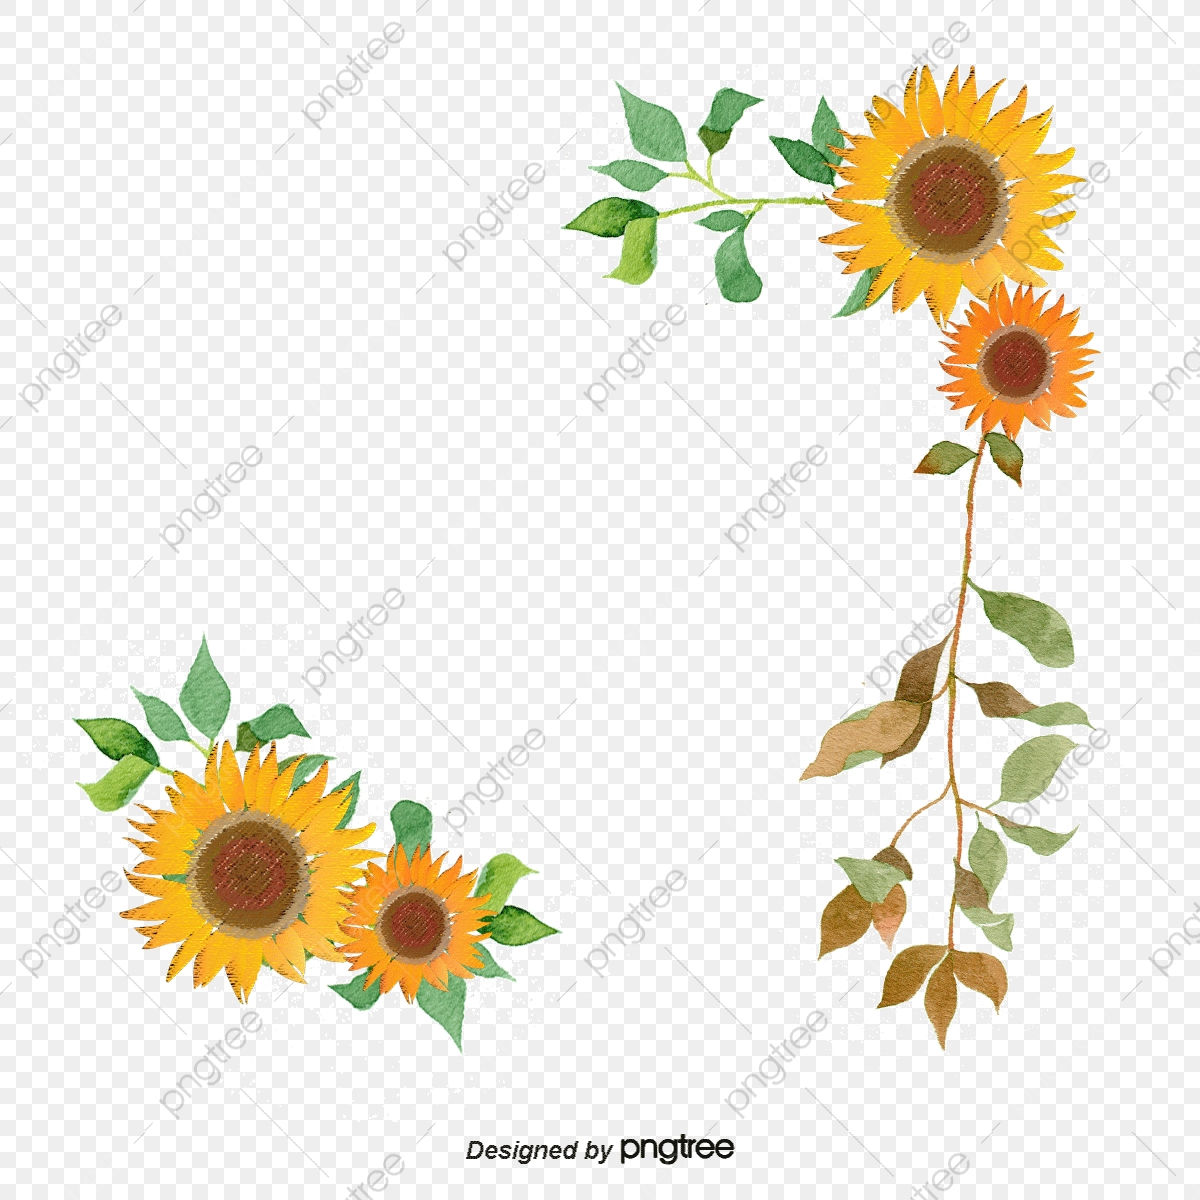 Sunflower Vector Png Free Sunflowers Sunflower Watercolor Watercolor Sunflowers Vector Images Pngtree